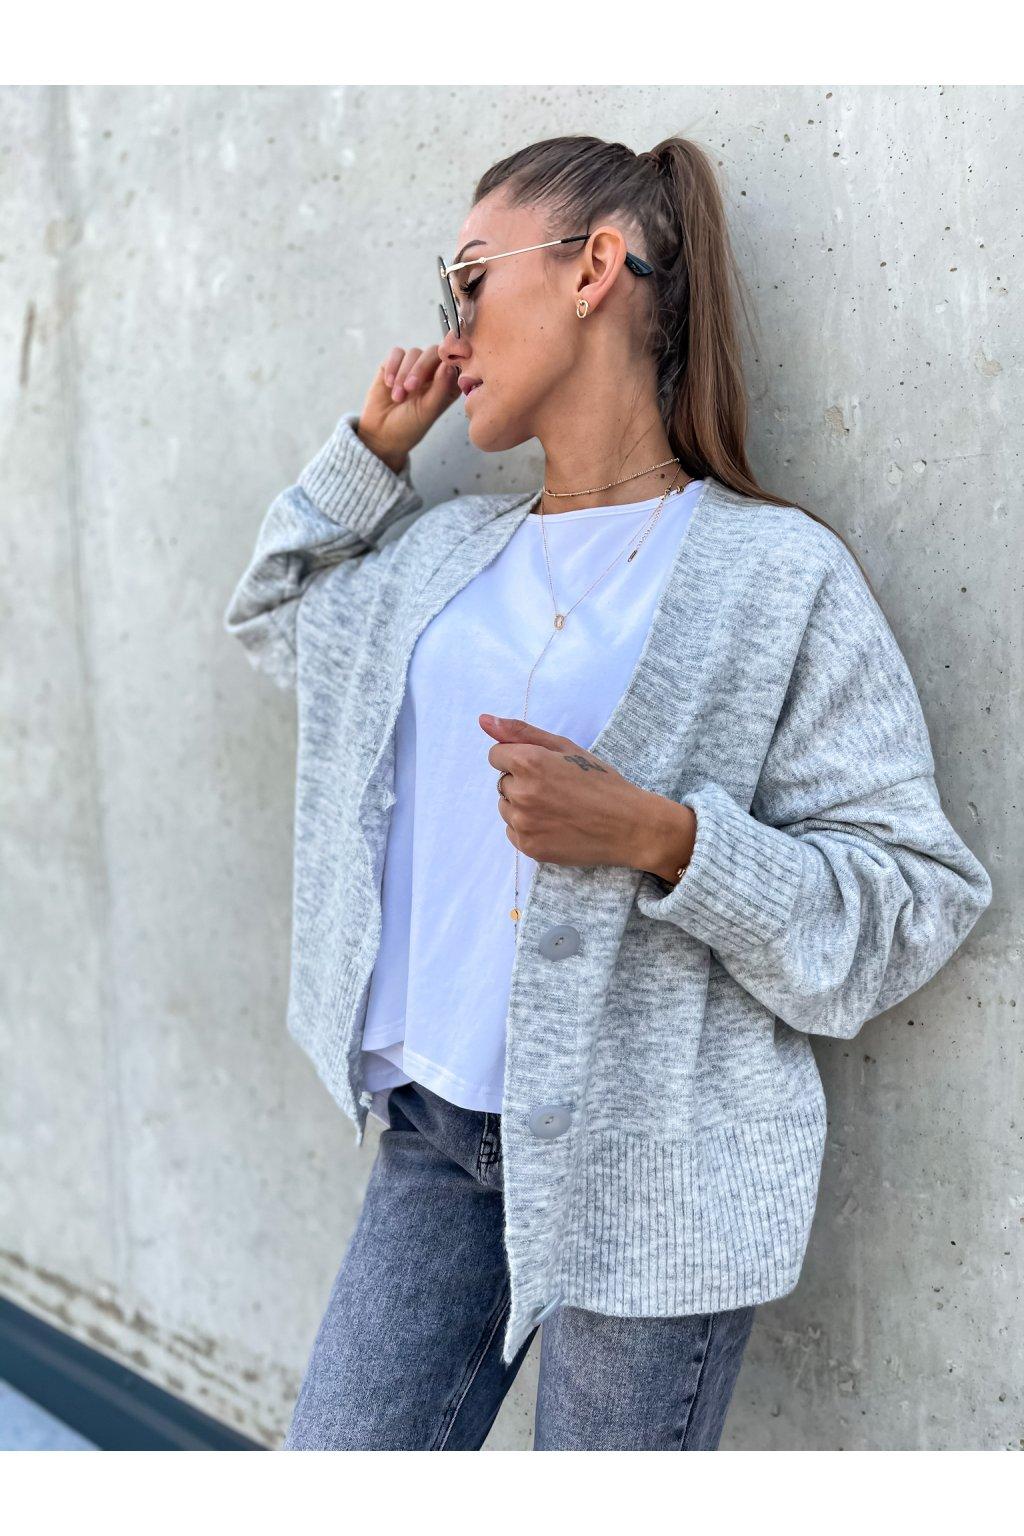 damsky svetr s knofliky grey eshopat cz 1